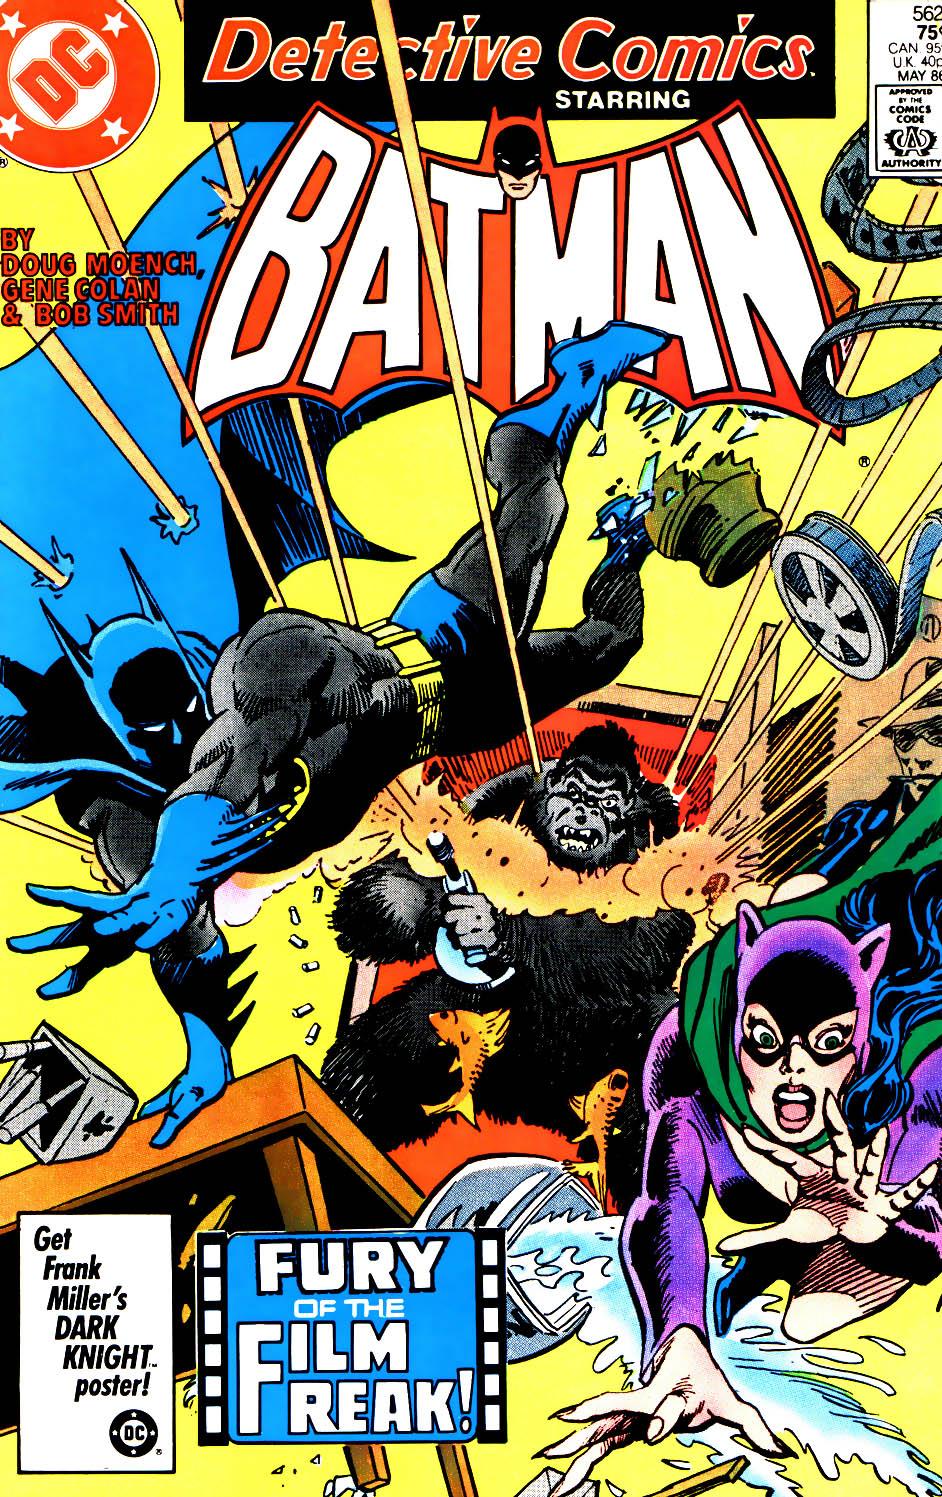 Detective Comics (1937) 562 Page 1